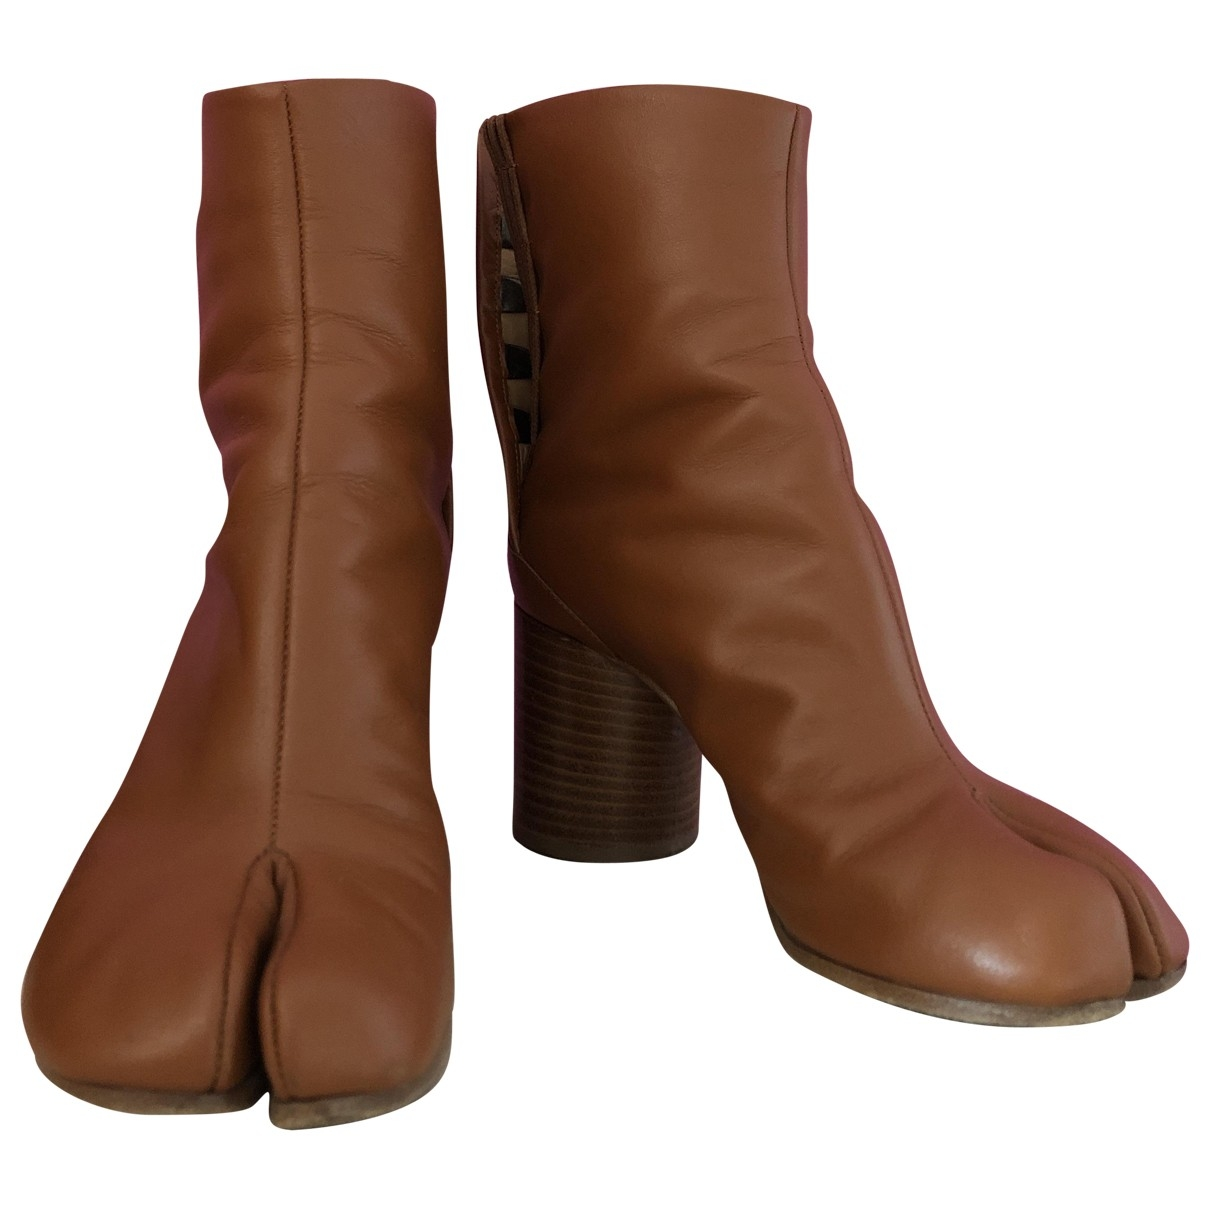 Maison Martin Margiela Tabi Brown Leather Ankle boots for Women 36 EU